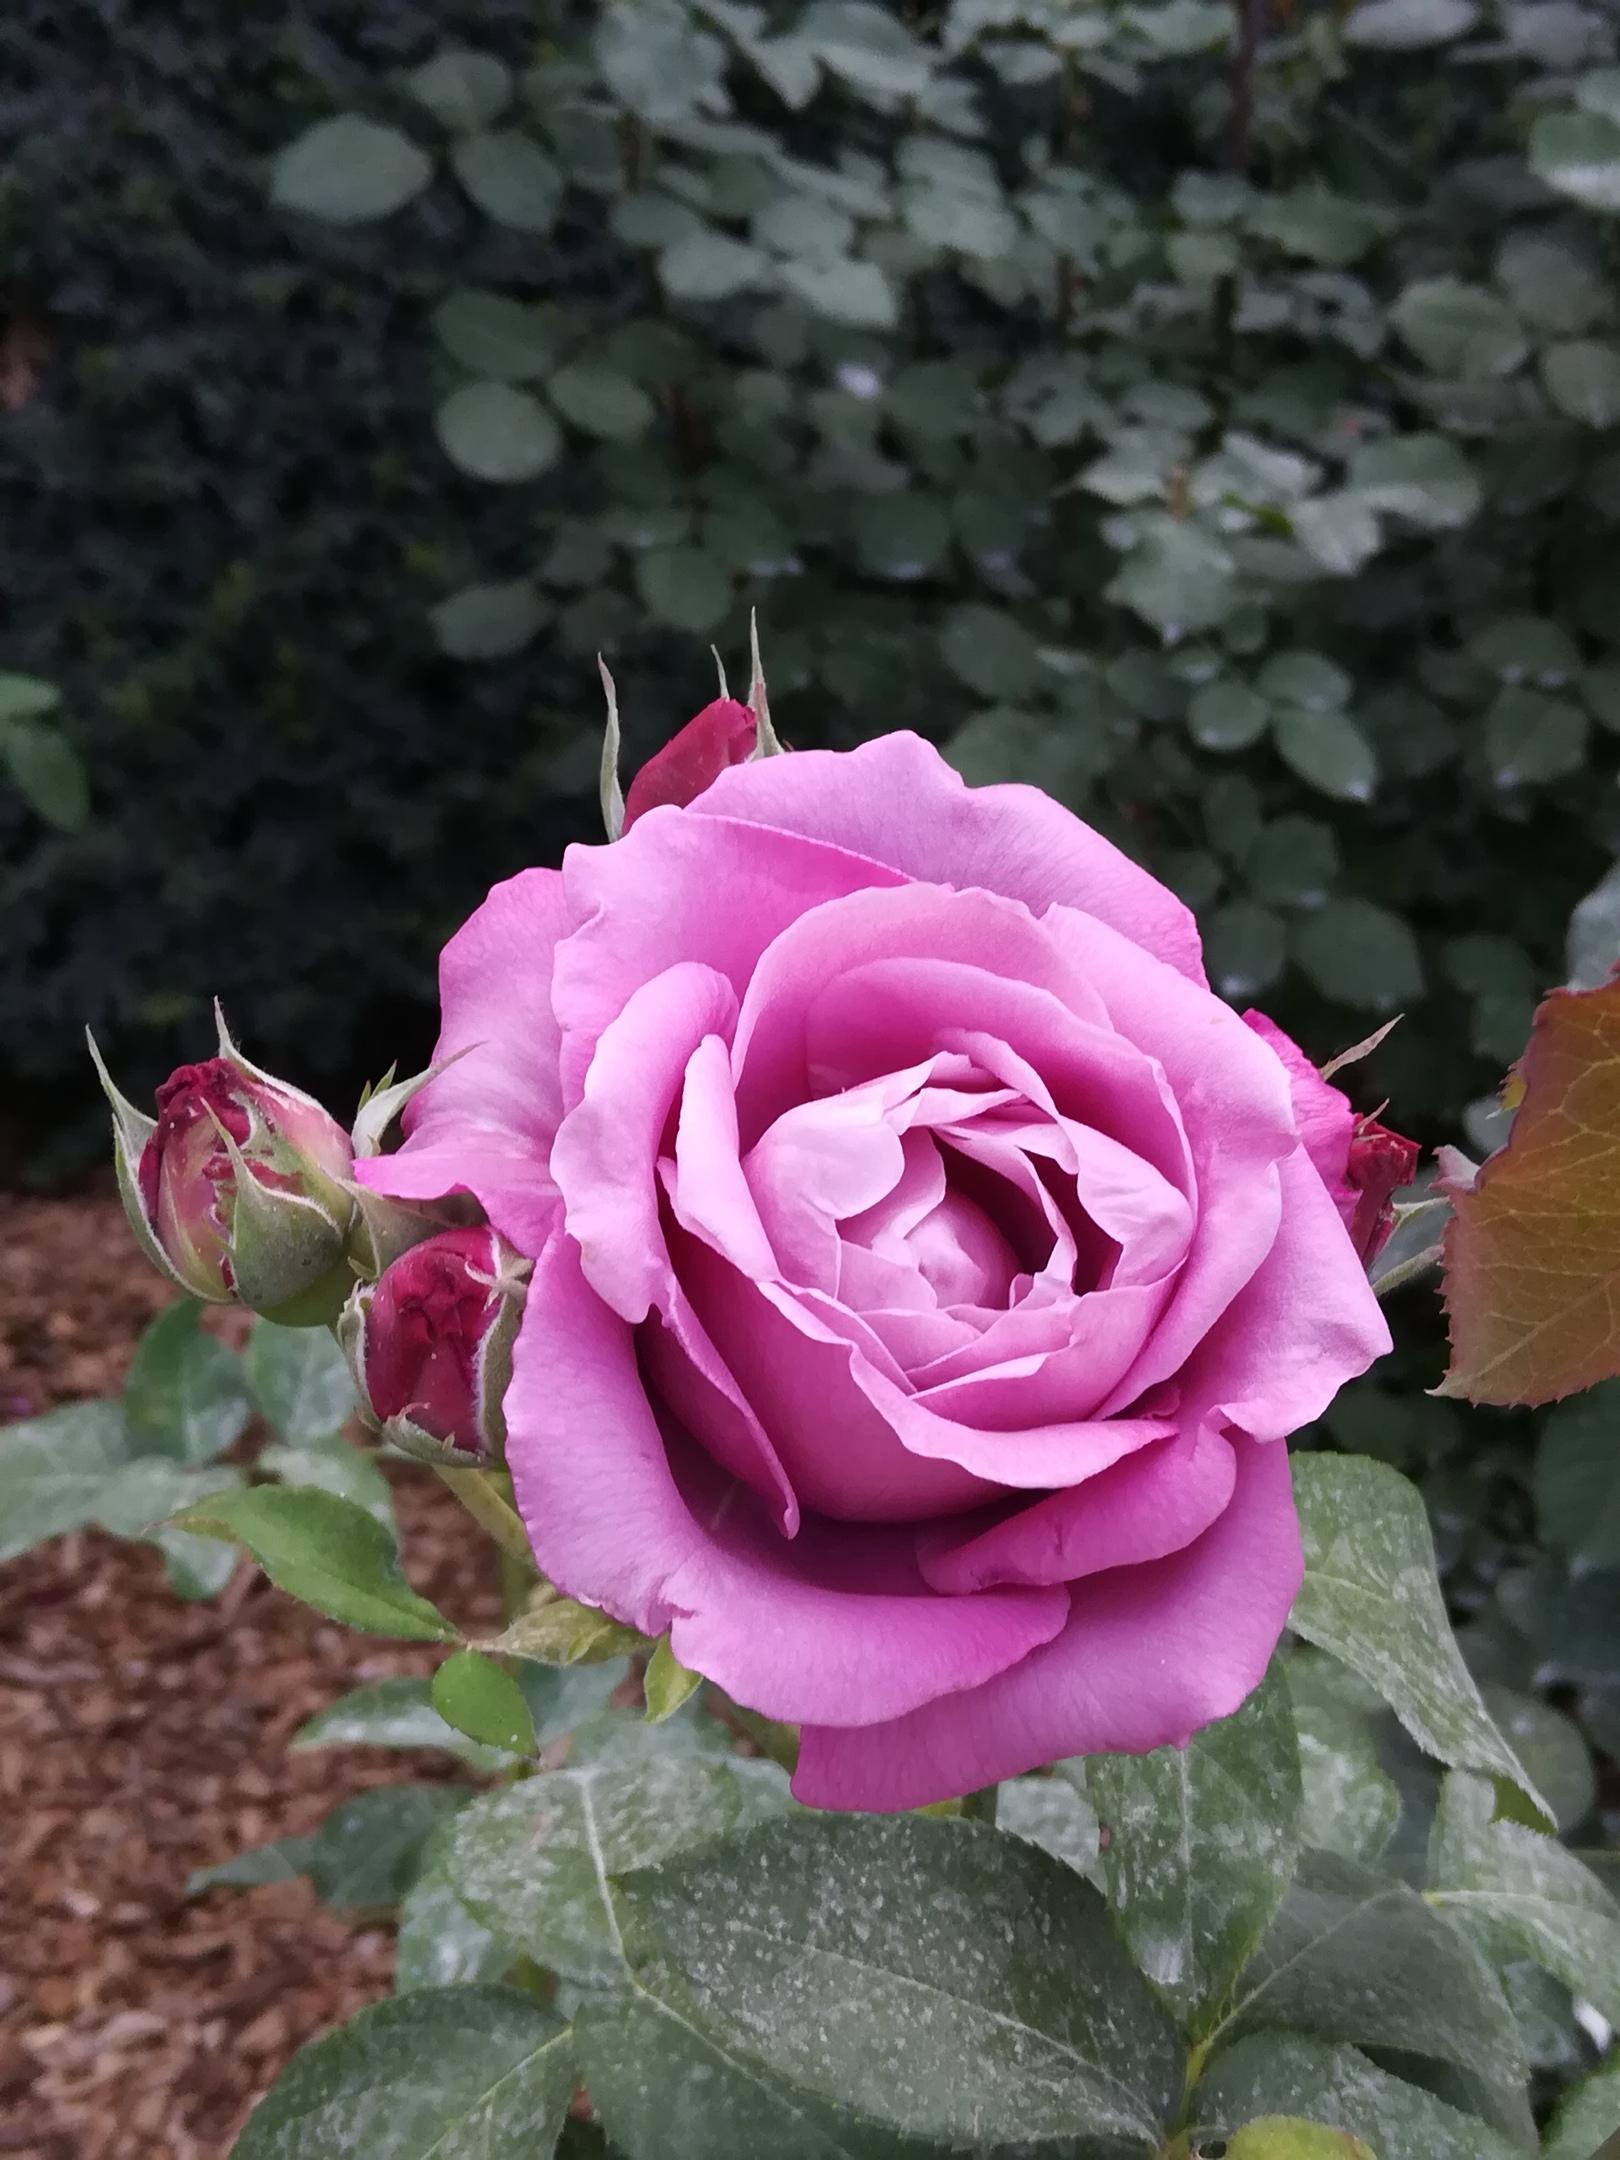 РОСКОШНАЯ КРАСАВИЦА. Блиц: розы